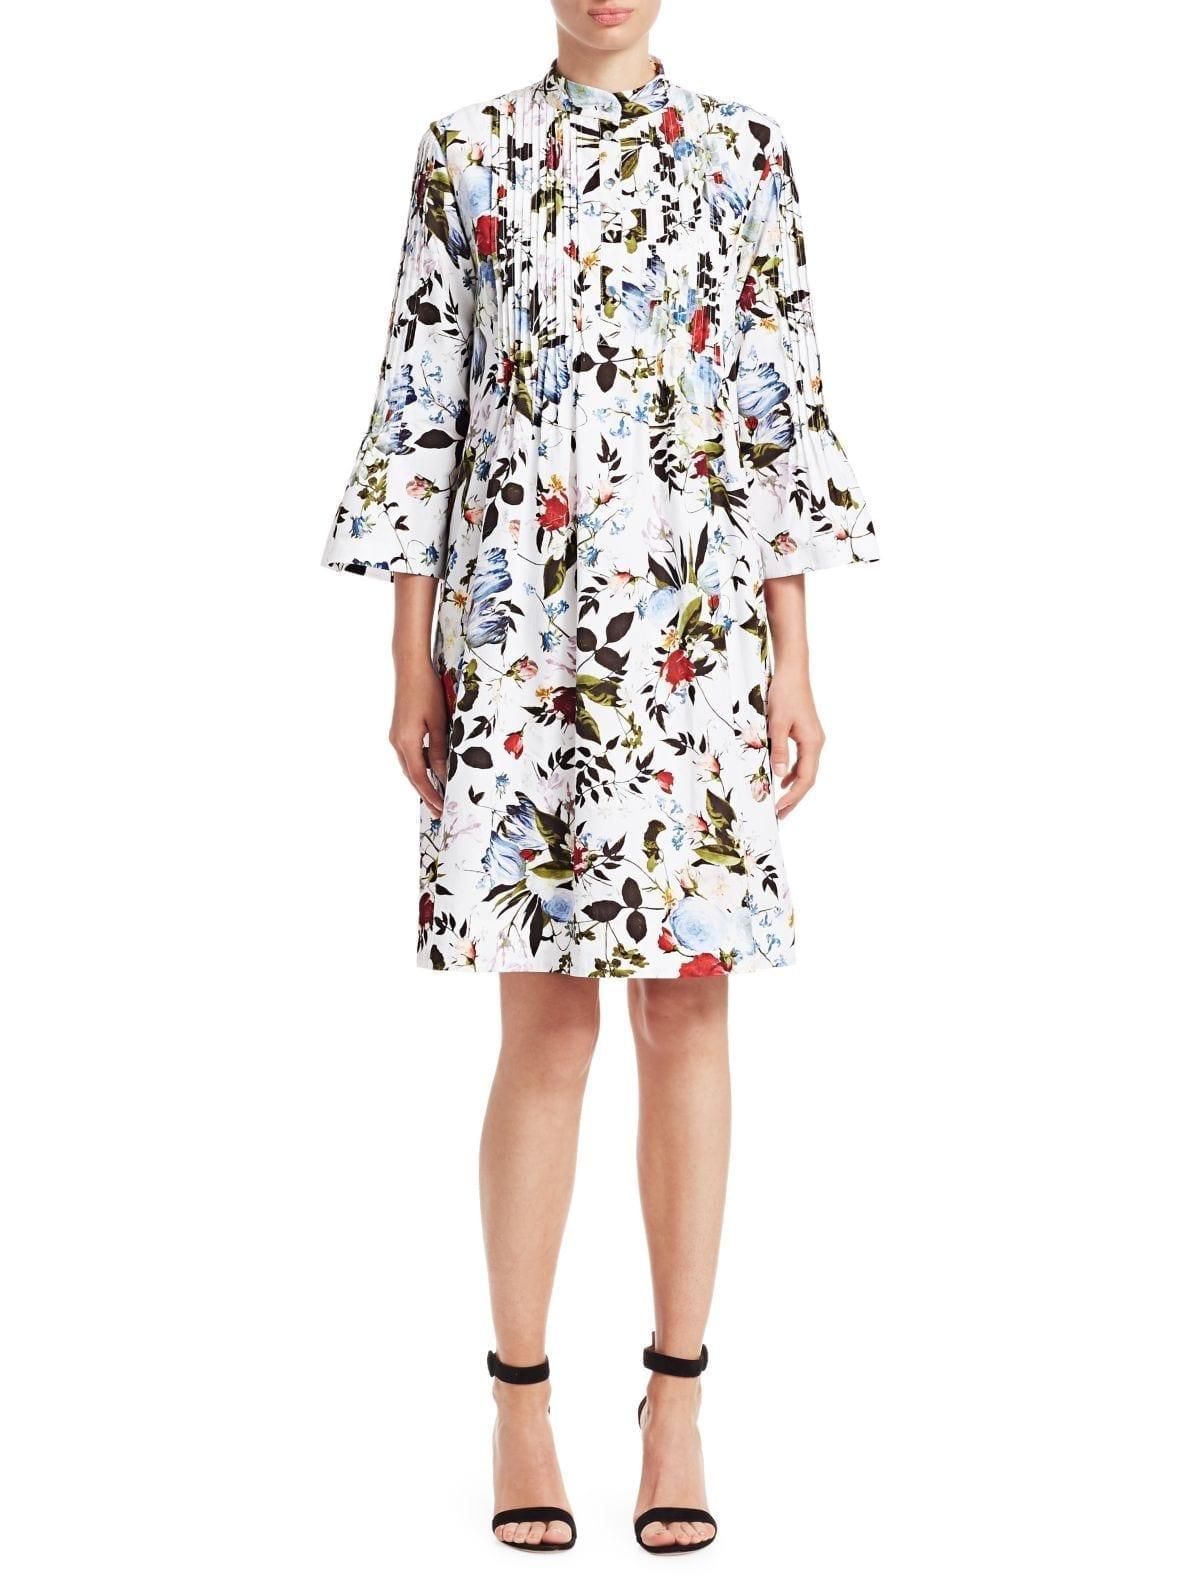 ERDEM Reagan Plisse A-Line Shirt White / Floral Printed Dress